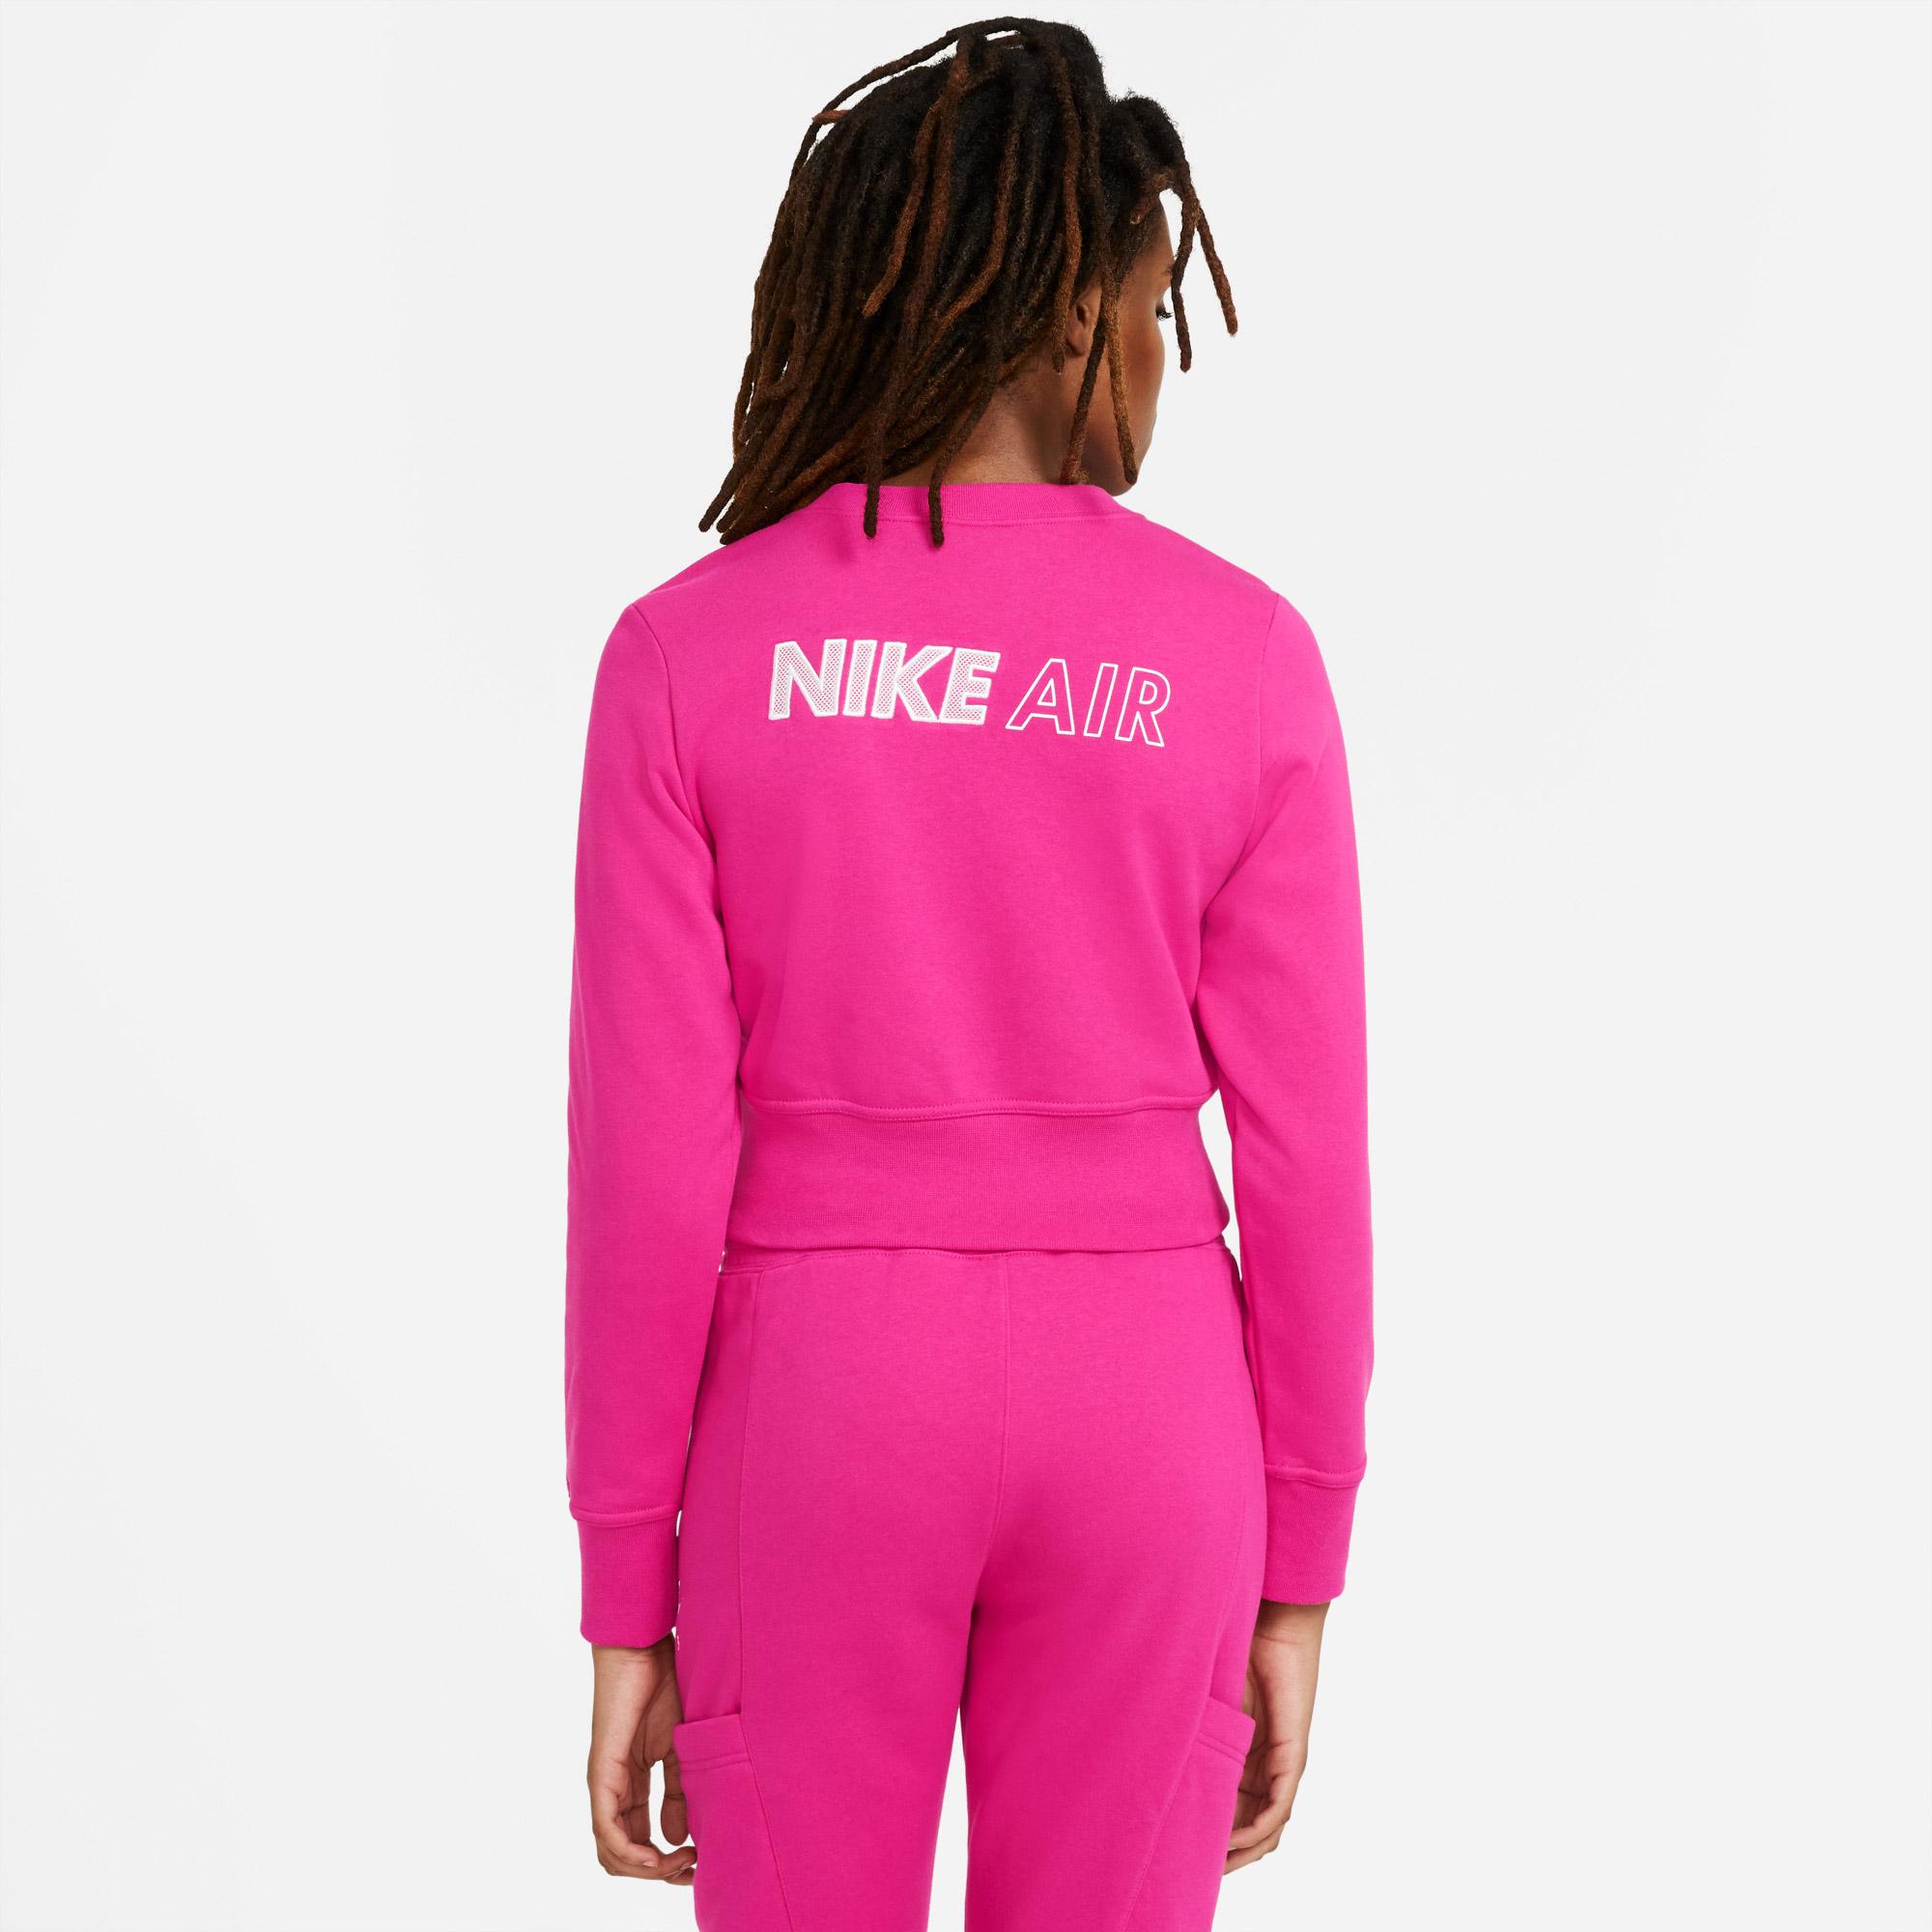 Nike Air Kadın Pembe Sweatshirt